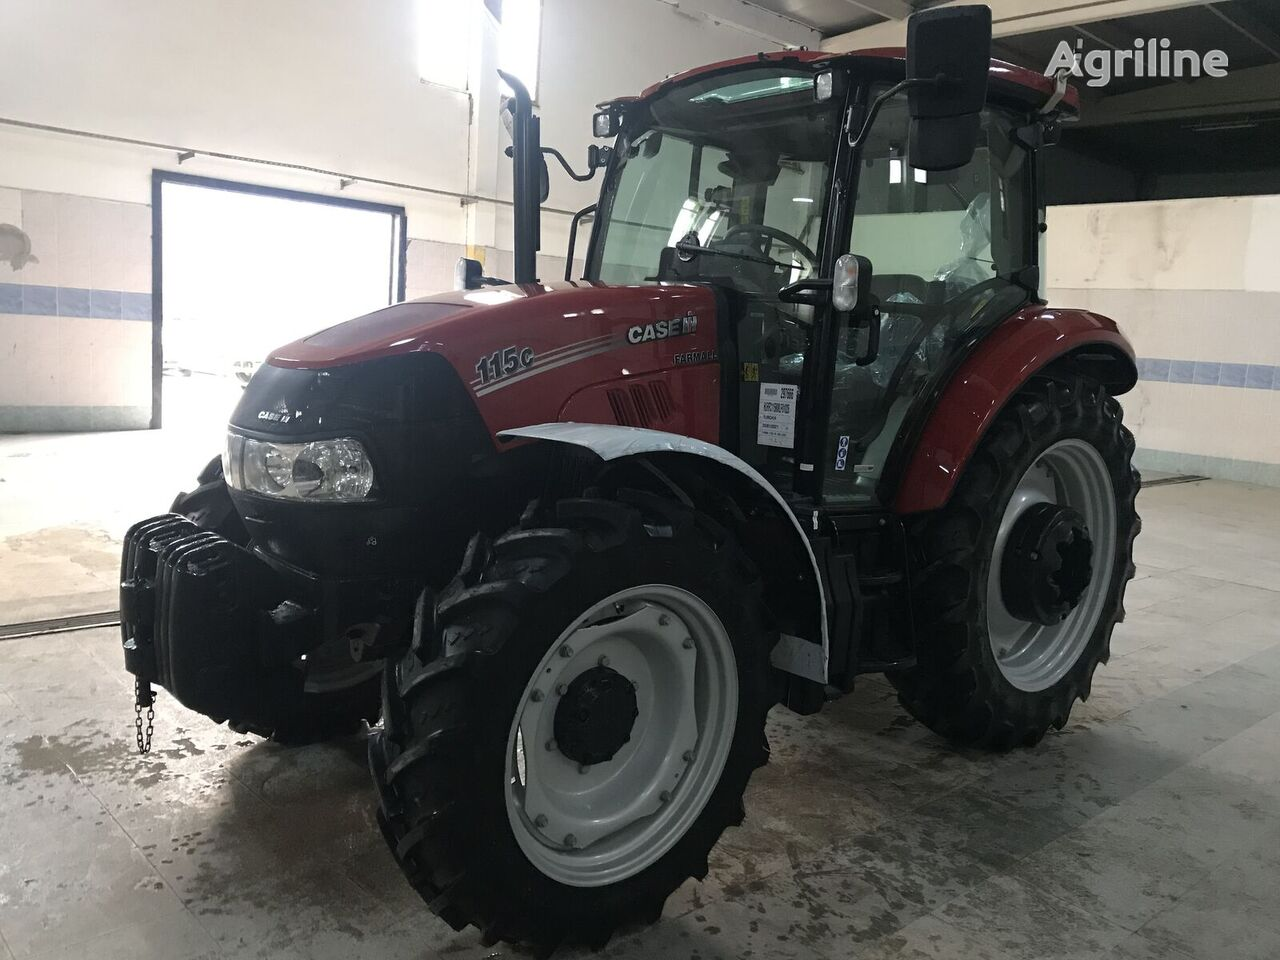 CASE IH JX 115 C mini tractor